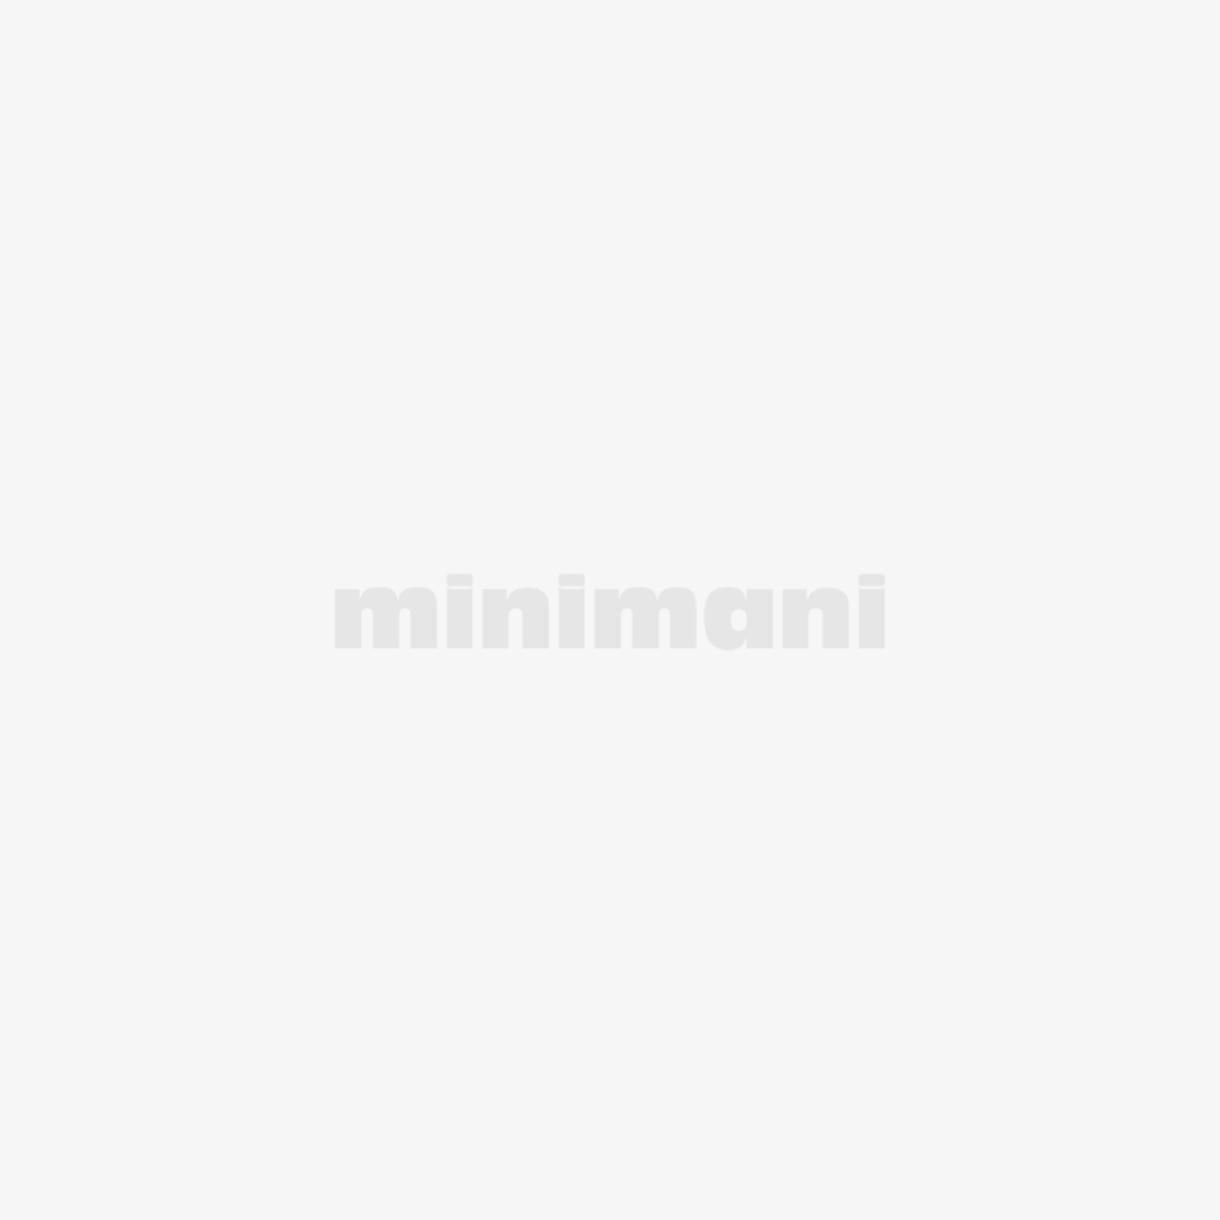 ONNLINE AJG910  KELAUTUVA